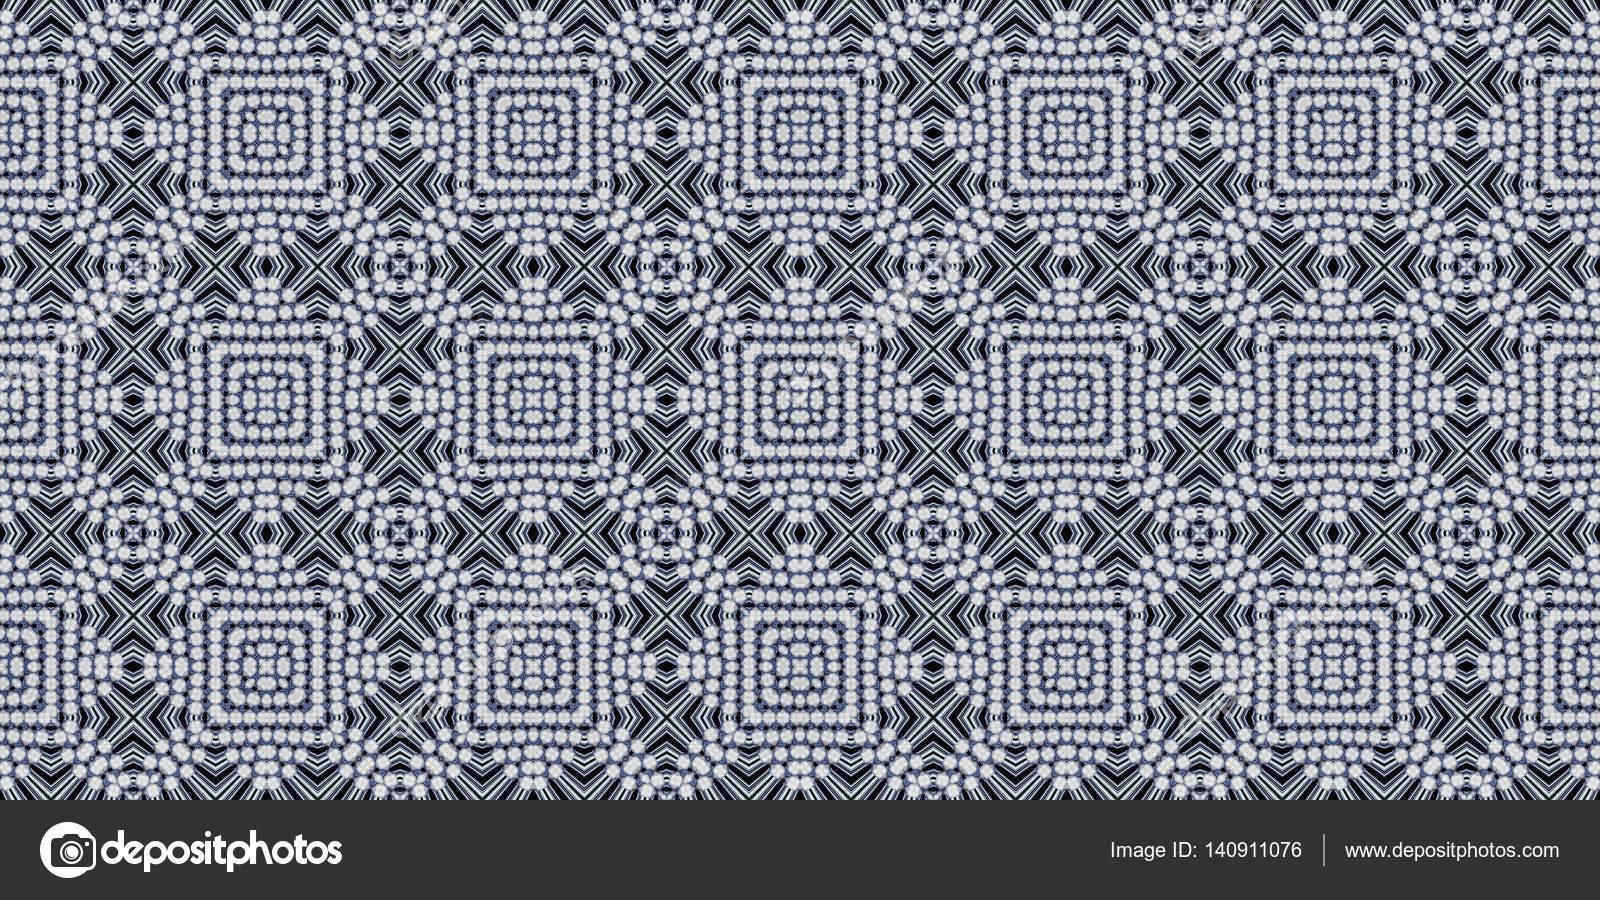 Modello senza cuciture monohrome texture di patchwork mosaico